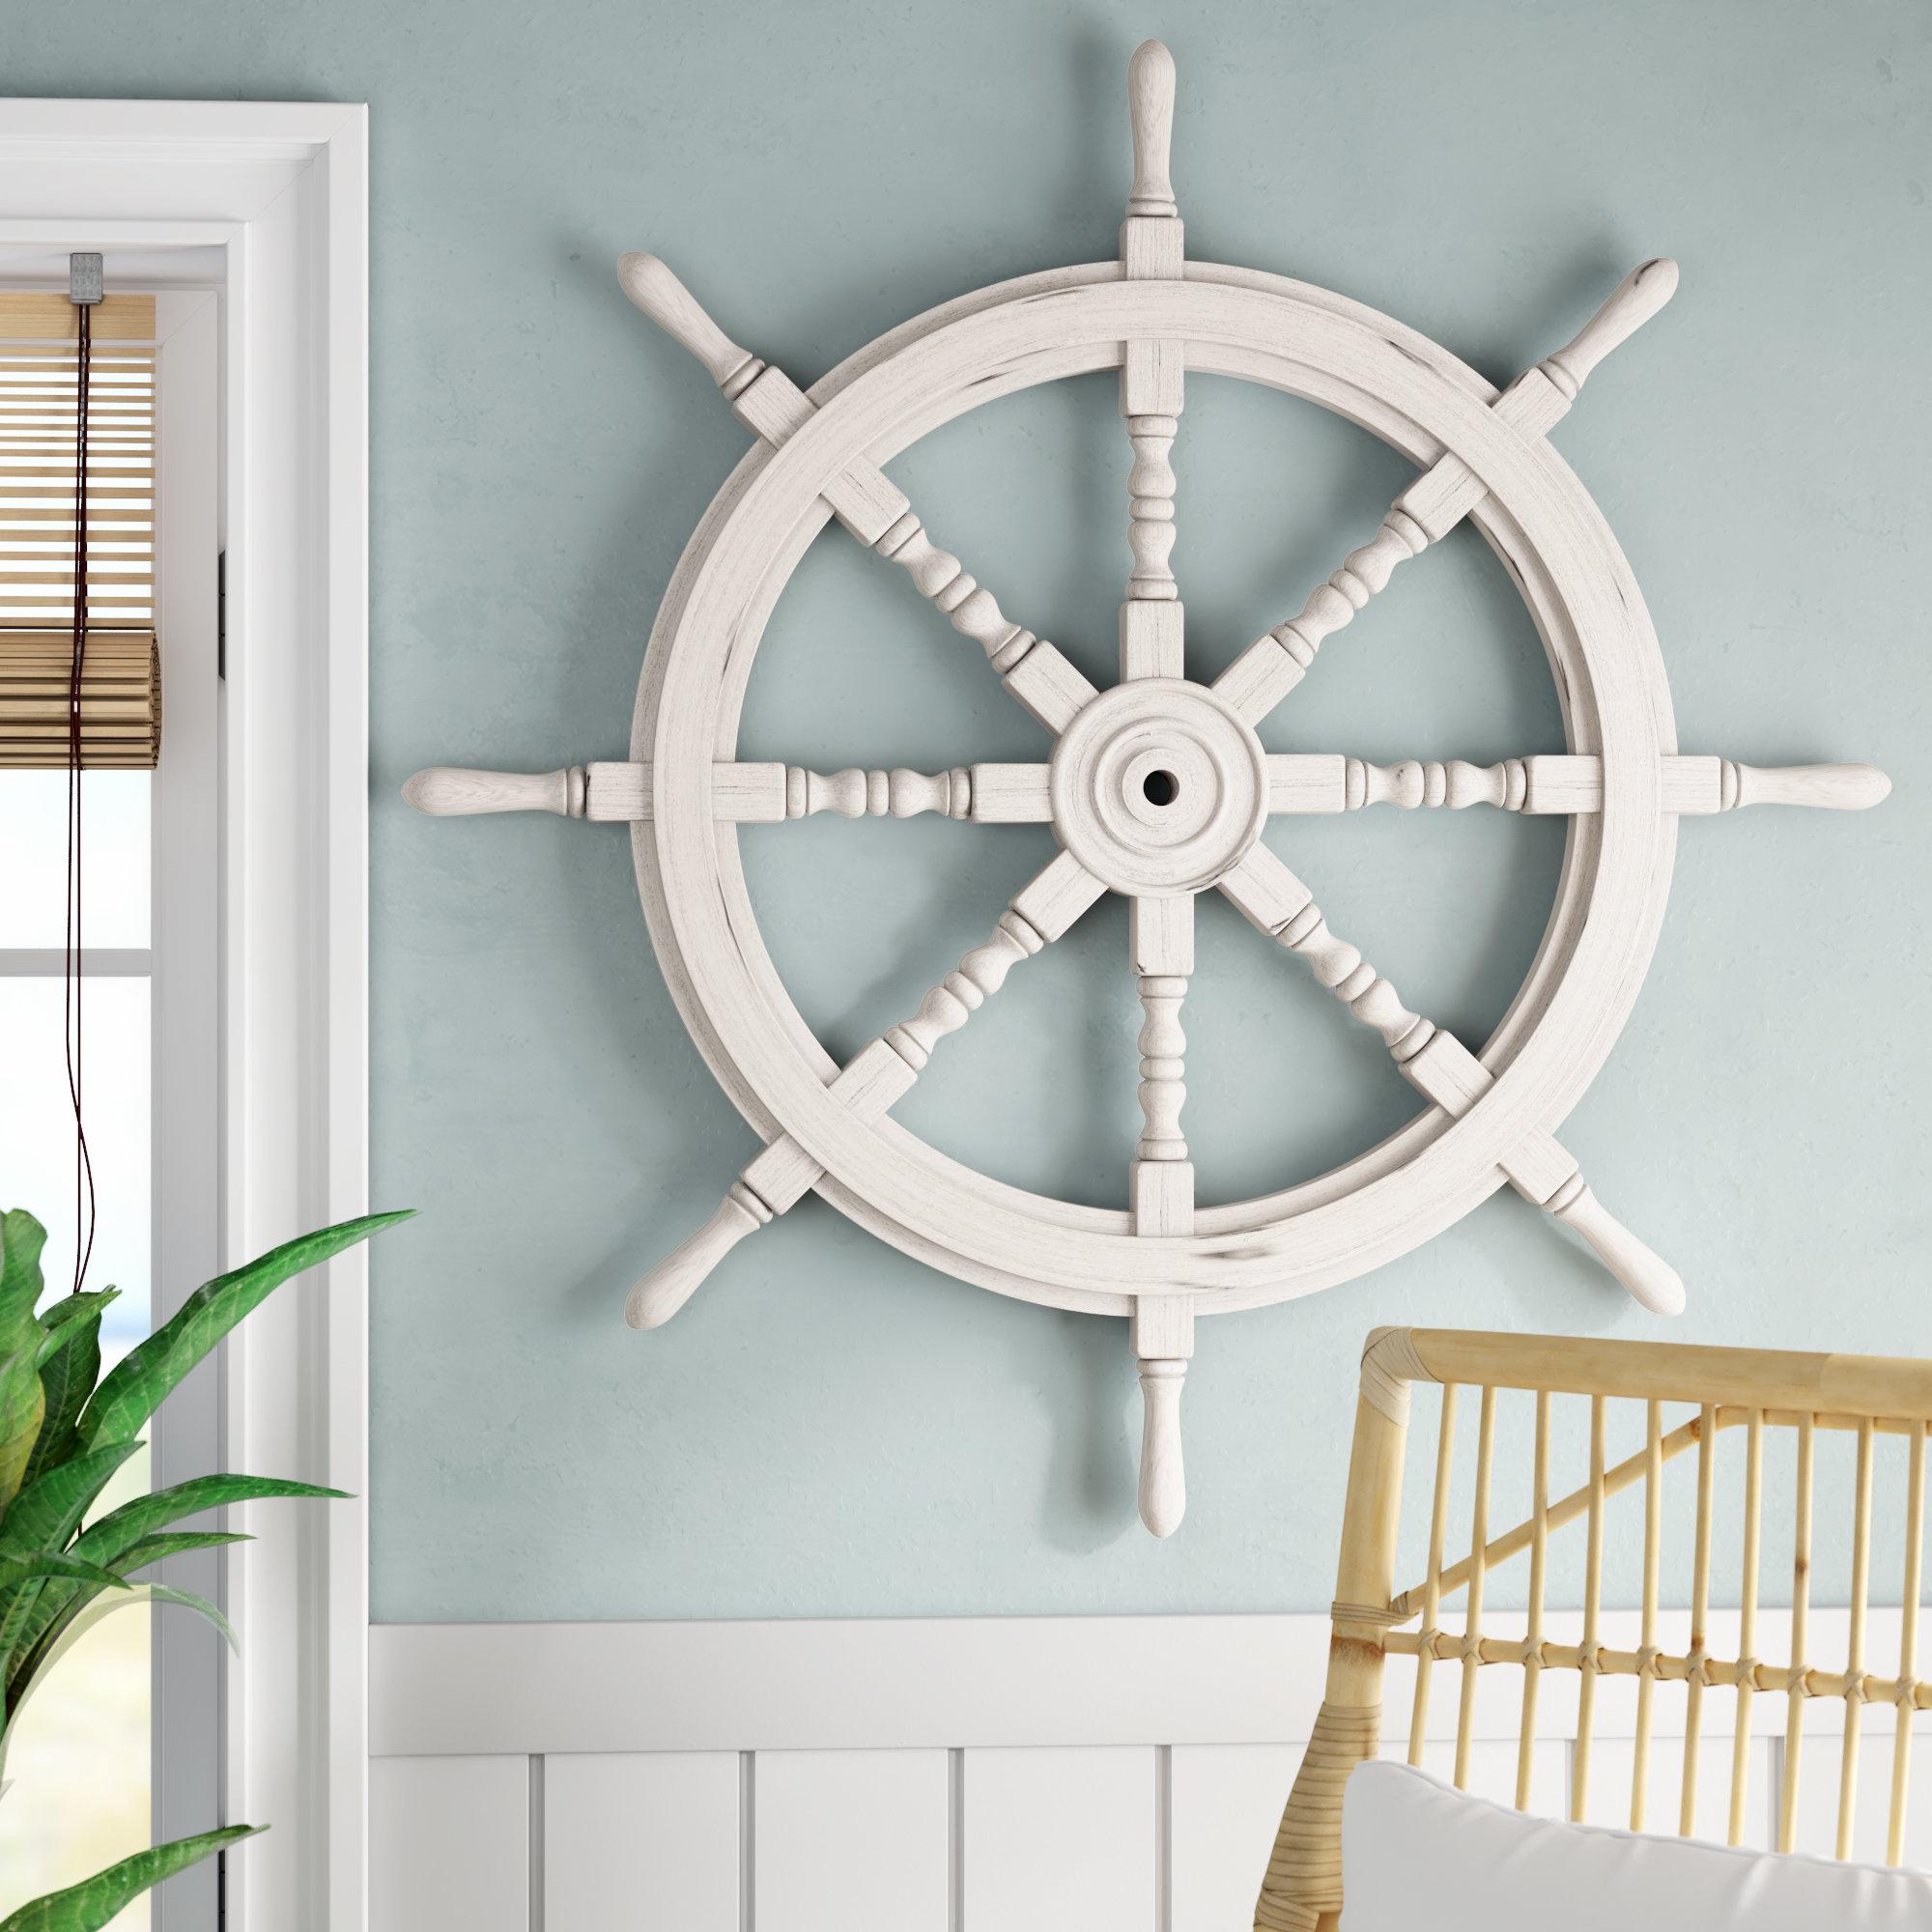 Captains Wheel Wall Decor | Wayfair Regarding Millanocket Metal Wheel Photo Holder Wall Decor (View 6 of 30)